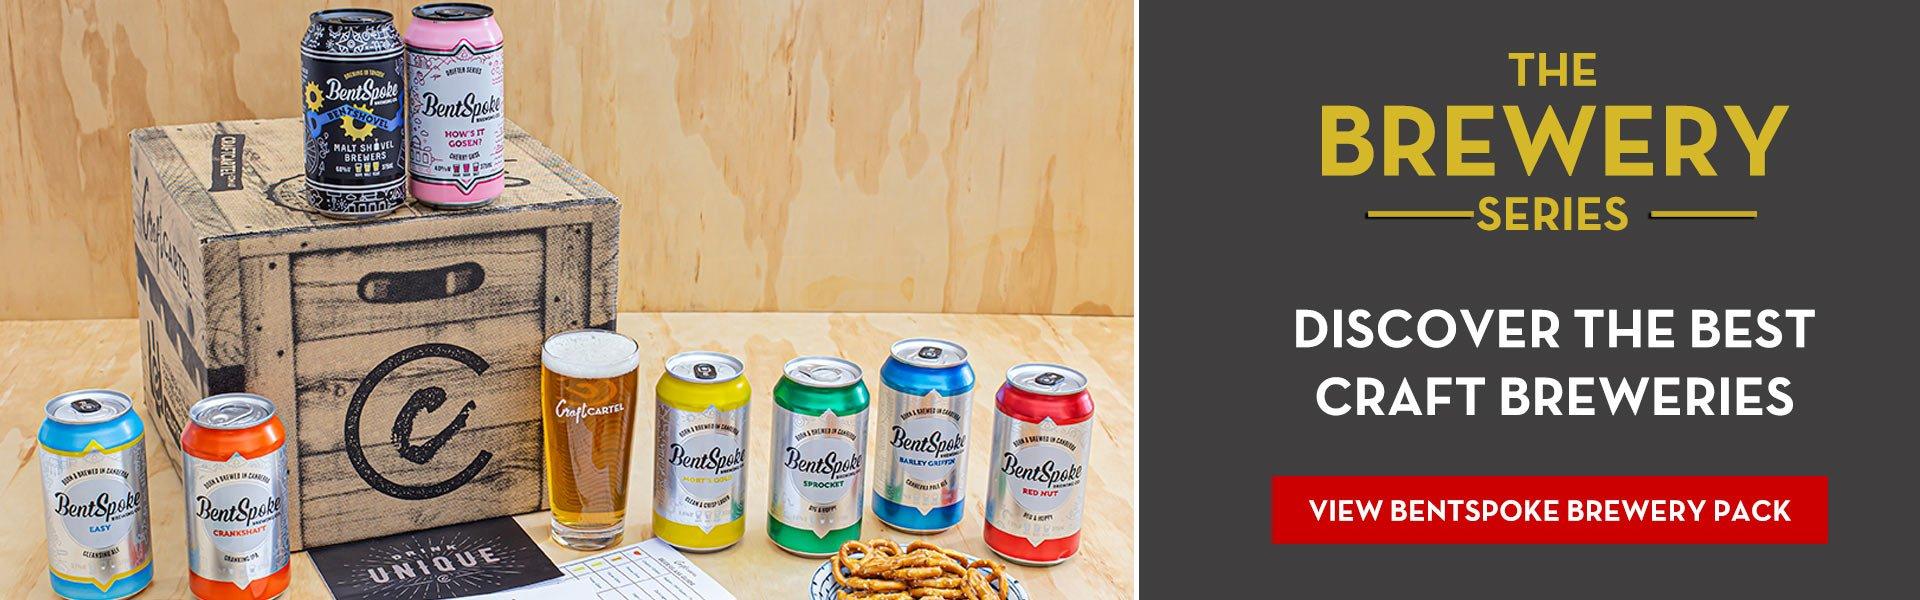 Bentspoke-Brewery-Pack-banner-website